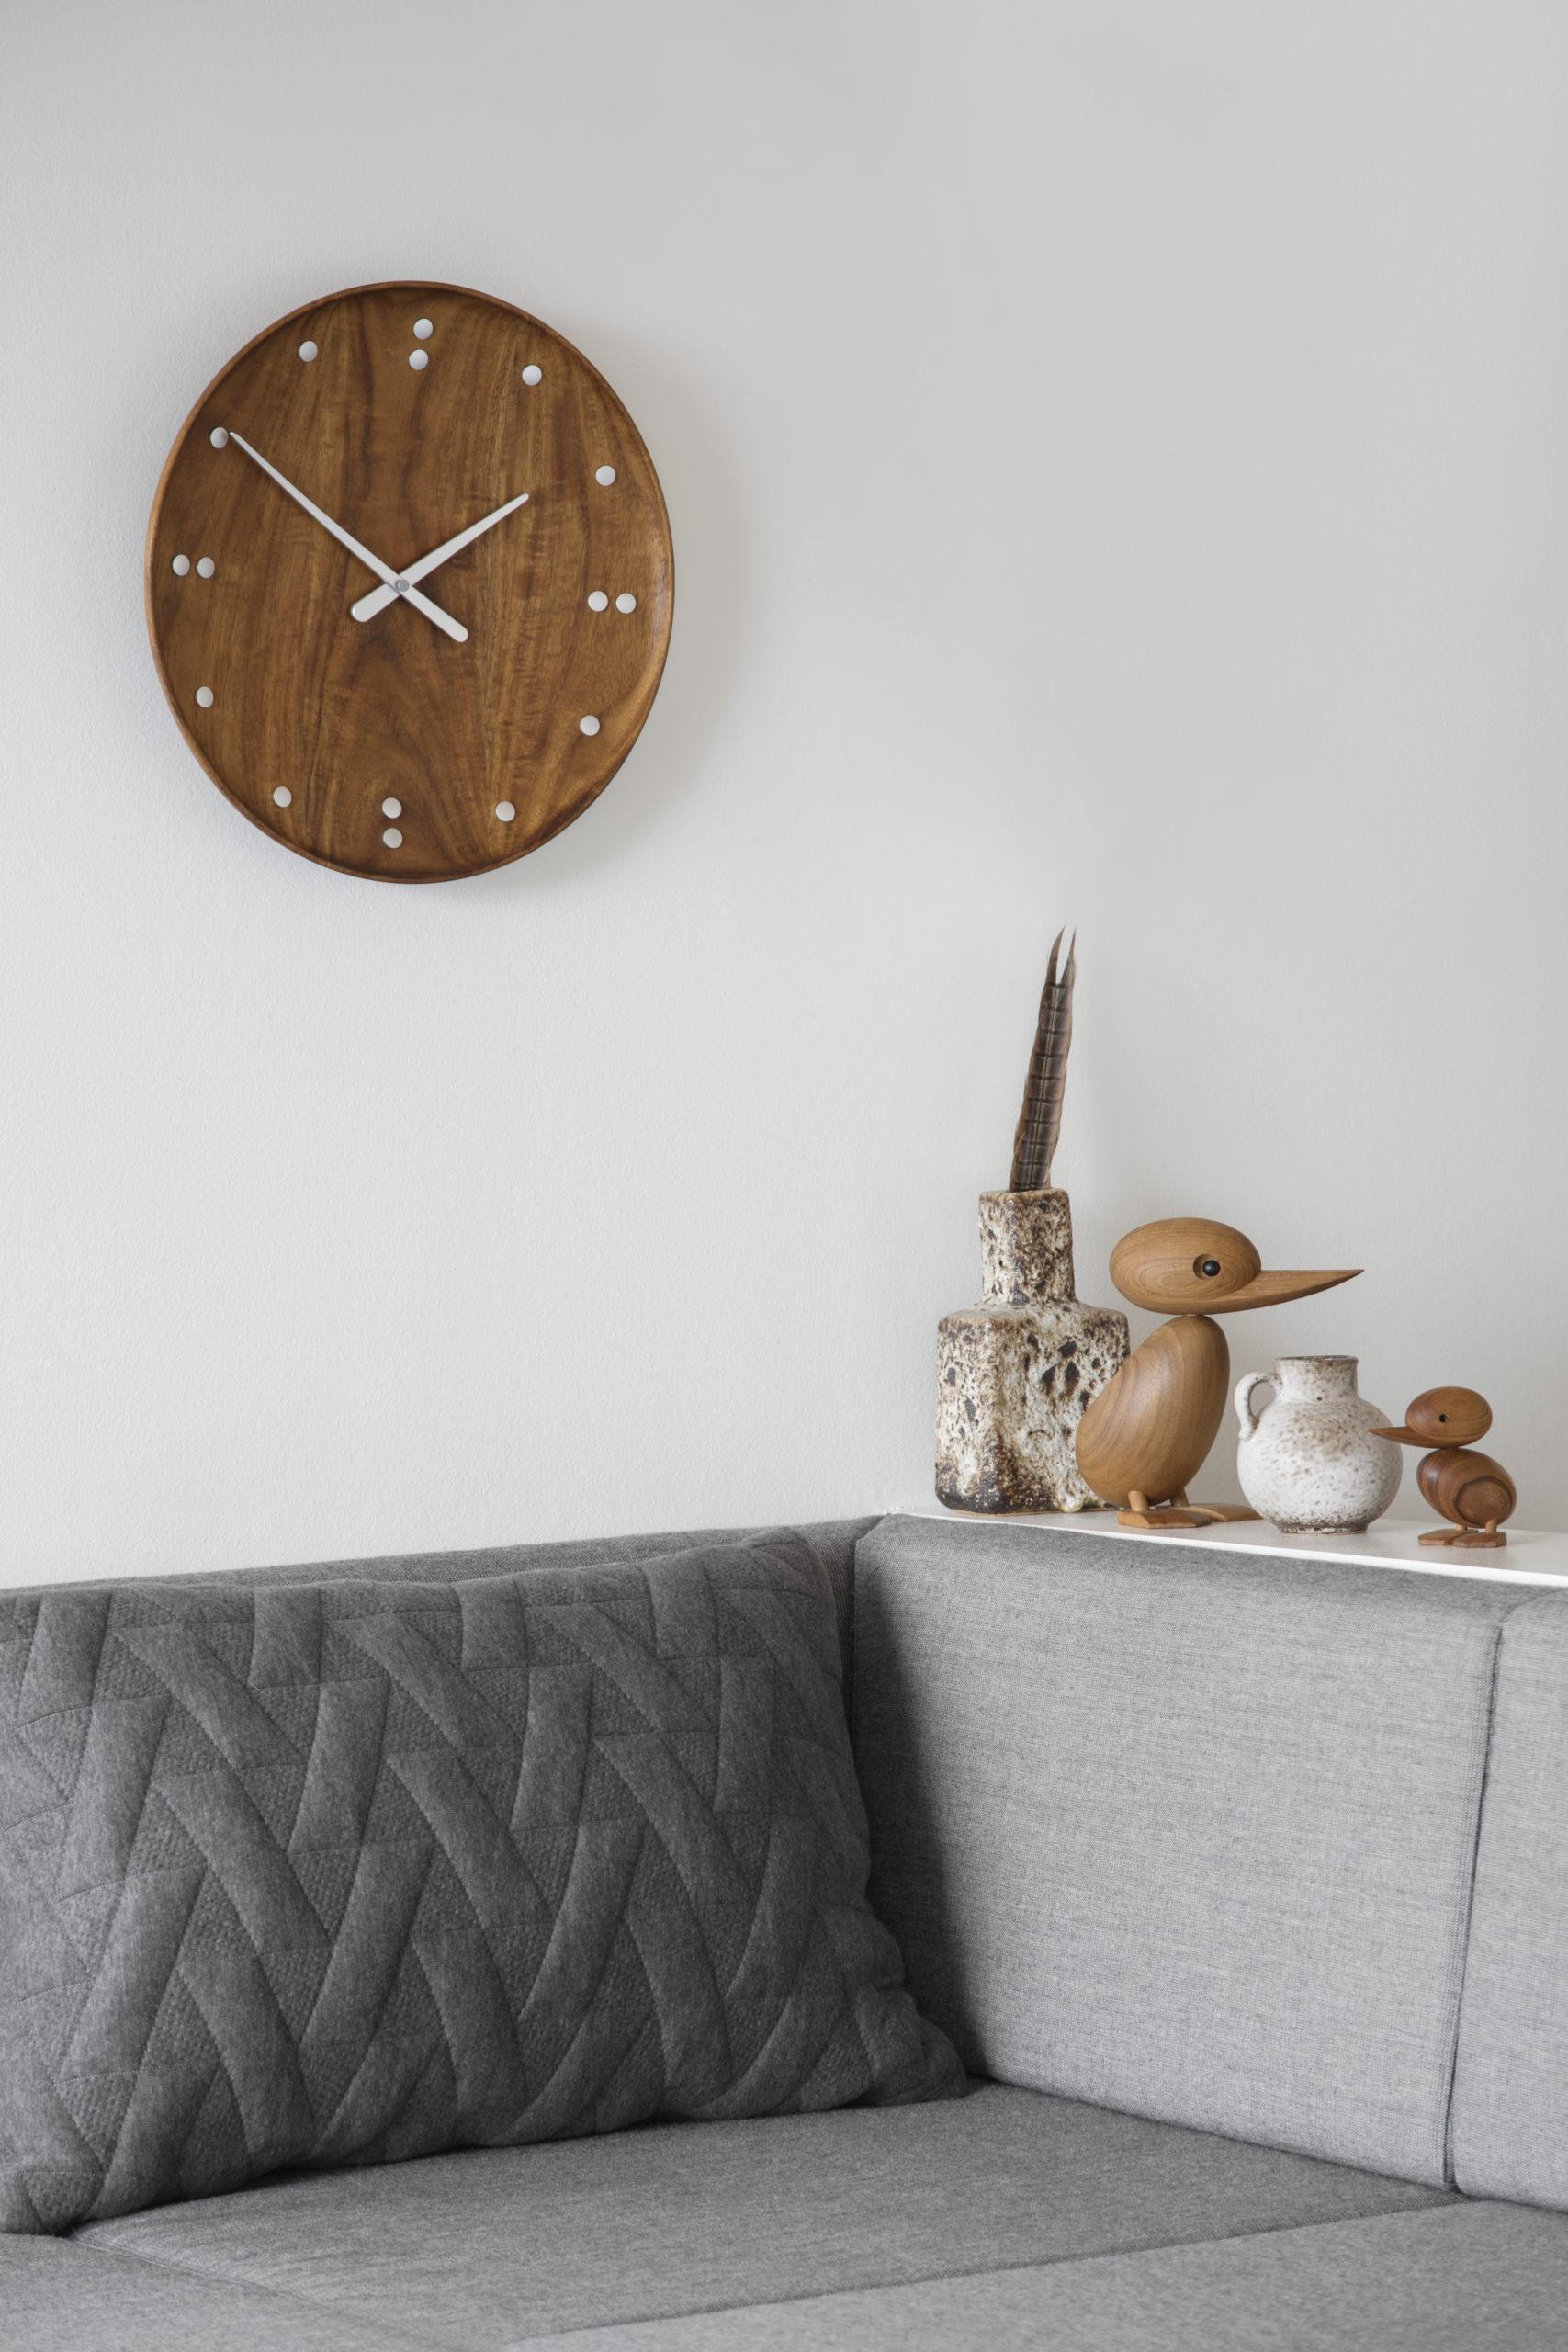 Architectmade-FJ-Clock-Wall-Clock-Teak-Wood-Denmark-Finn-Juhl